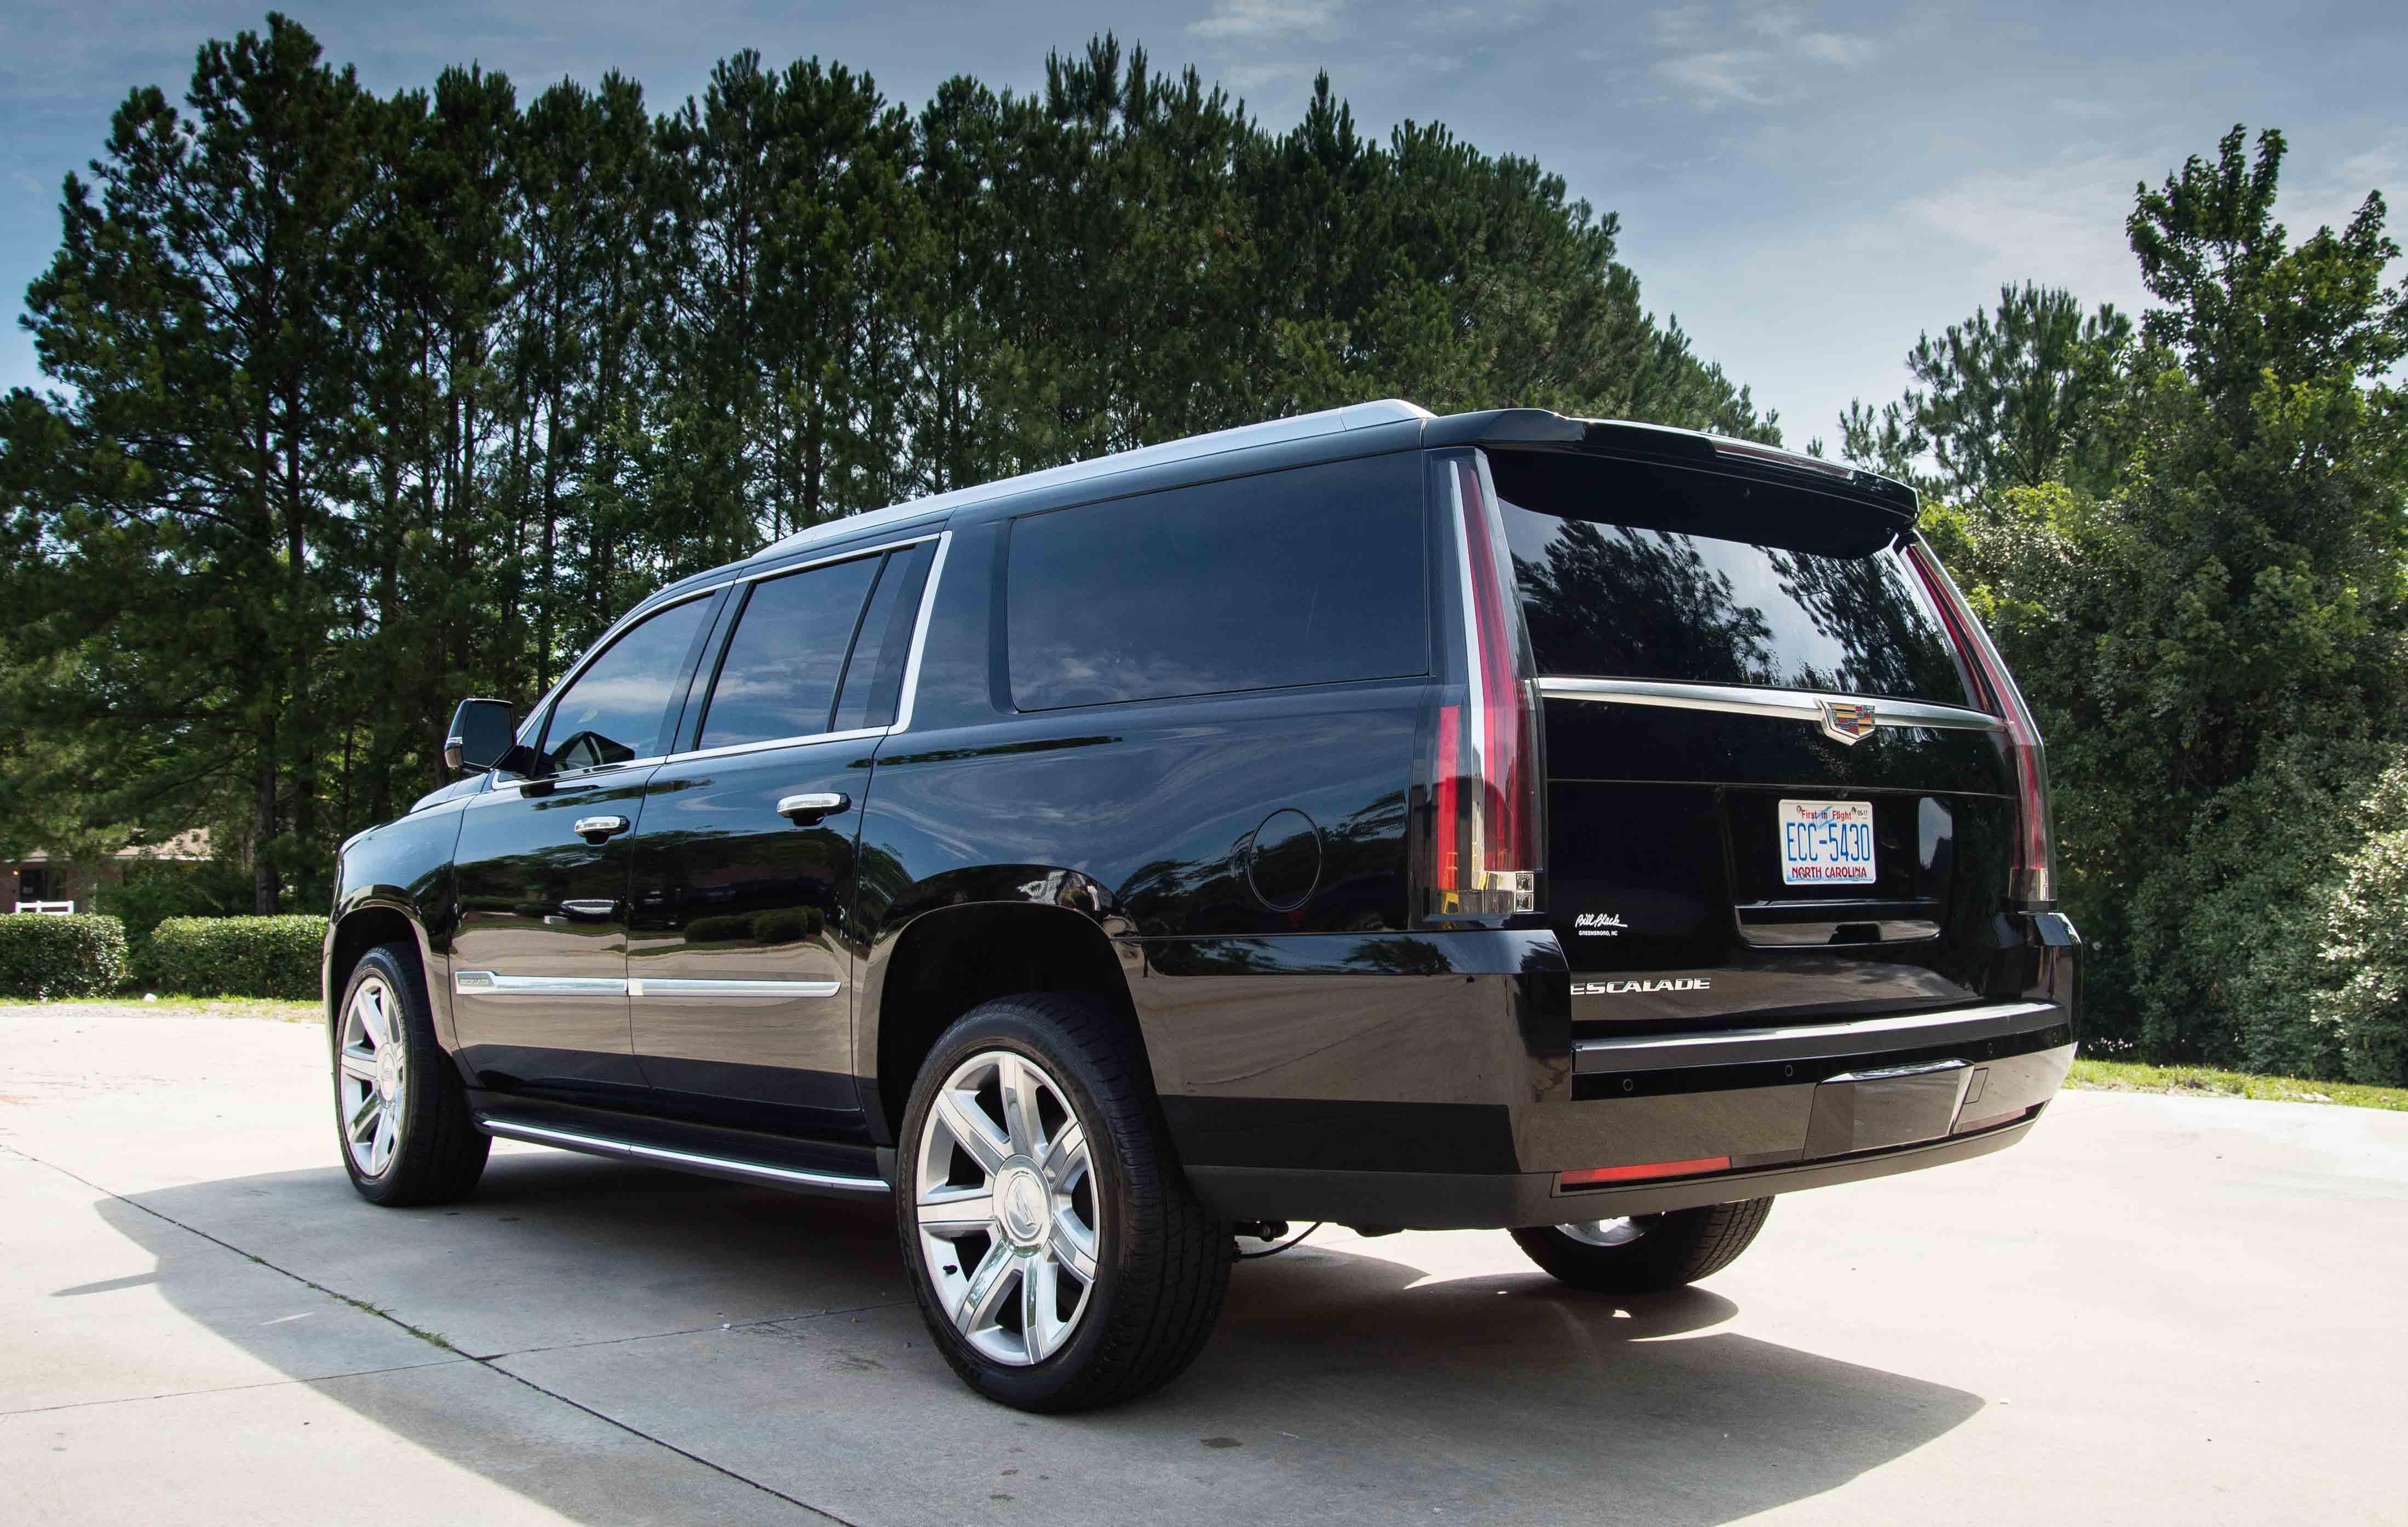 vehicles accessories states platinum escalade us pressroom esv united en cadillac media